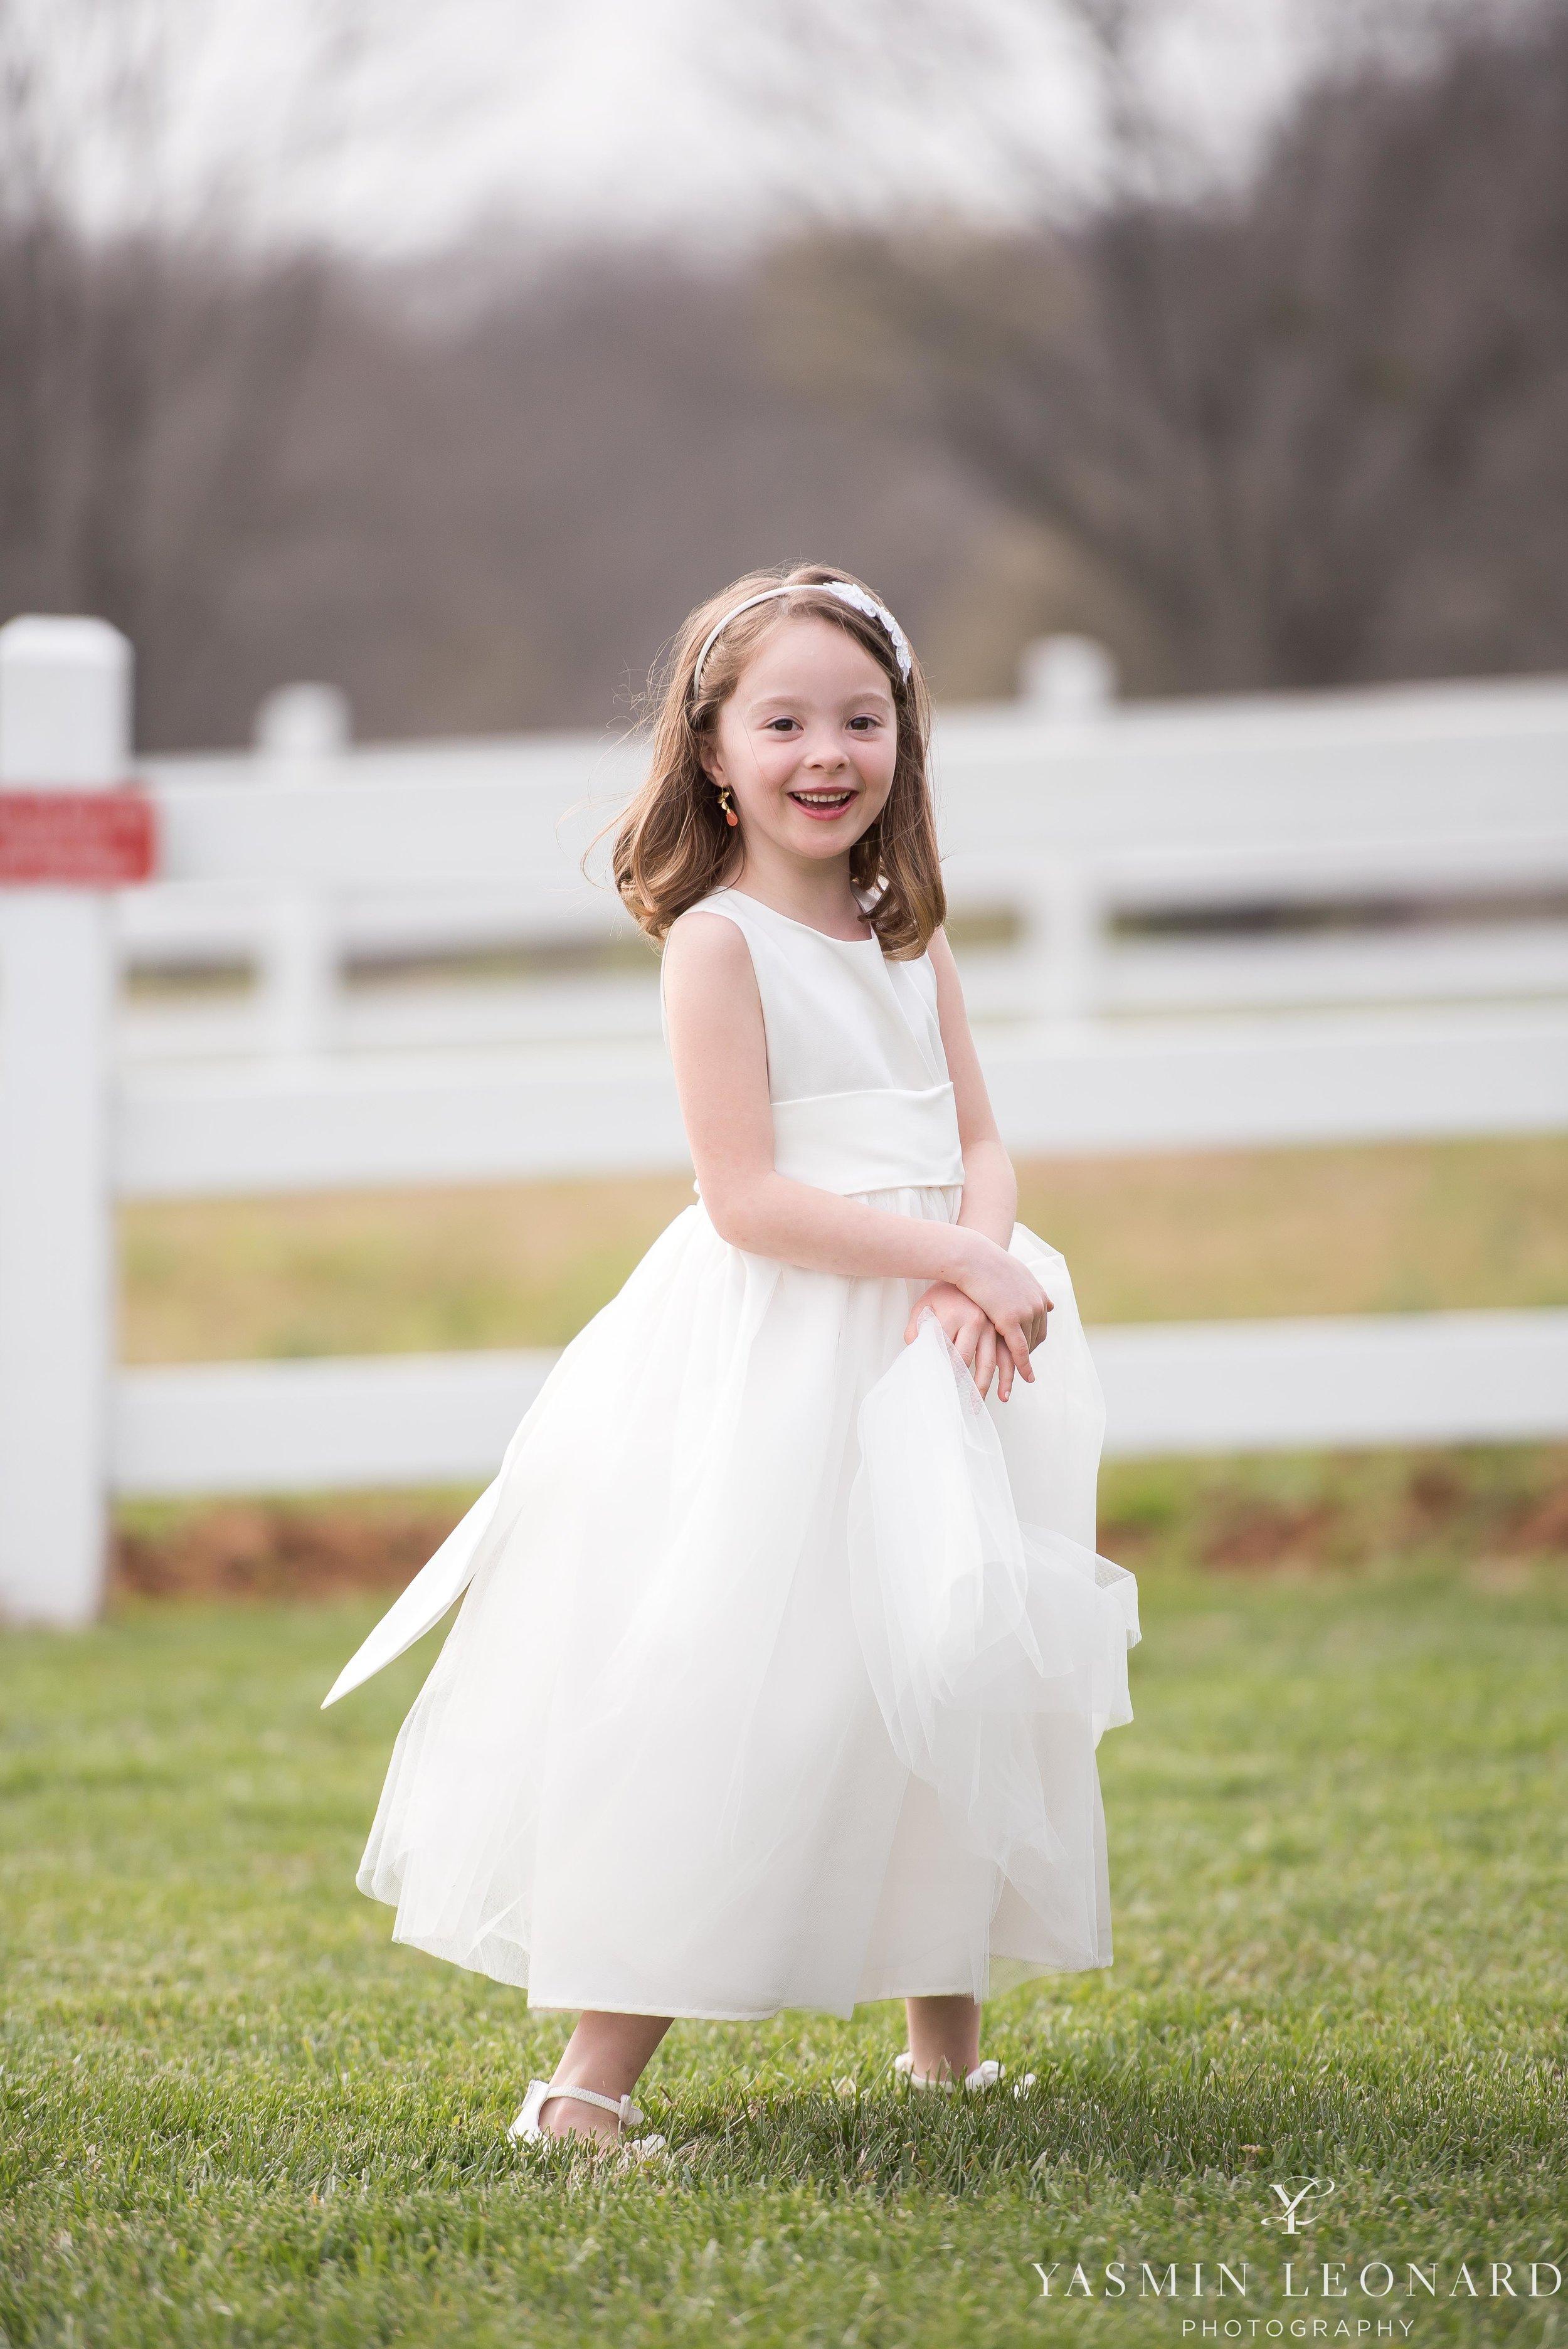 Adaumont Farm - Adaumont Farm Weddings - Trinity Weddings - NC Weddings - Yasmin Leonard Photography-22.jpg